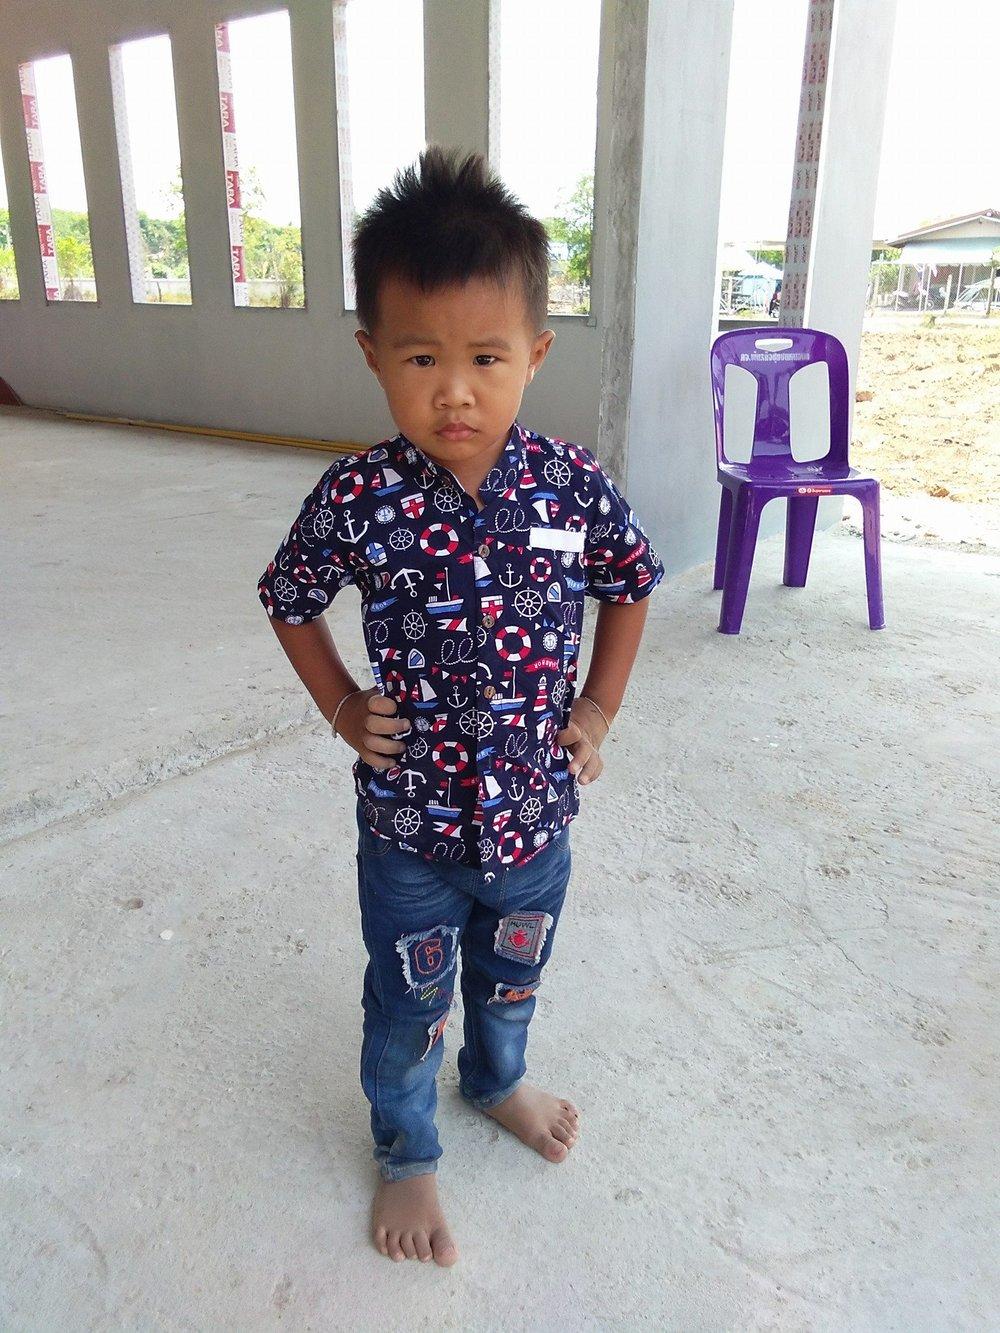 Sot Phar Sean Tanausab (5 years old, boy)